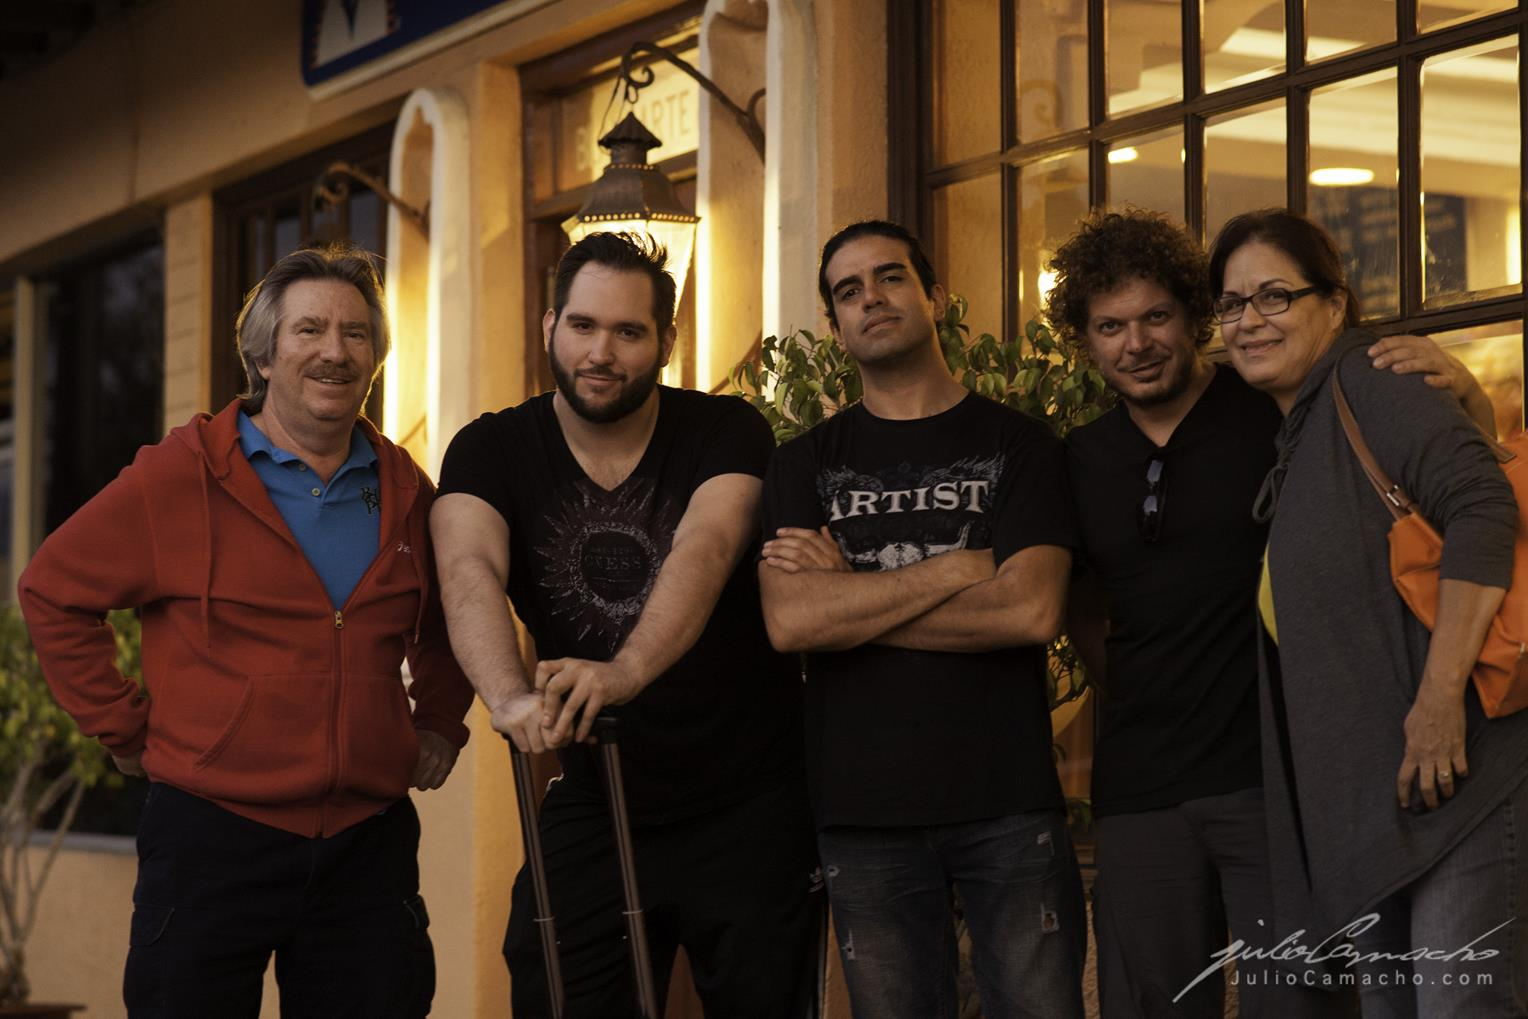 2014-10-30 31 CAST TOUR Ensenada y Tijuana - 0450 - www.Juli (Copy).jpg